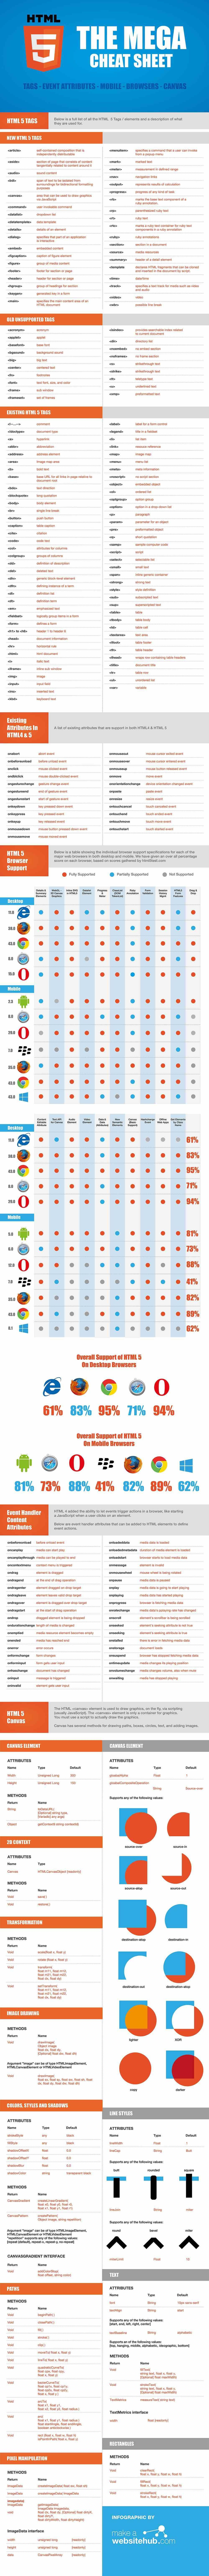 The #HTML5 Mega Cheat Sheet